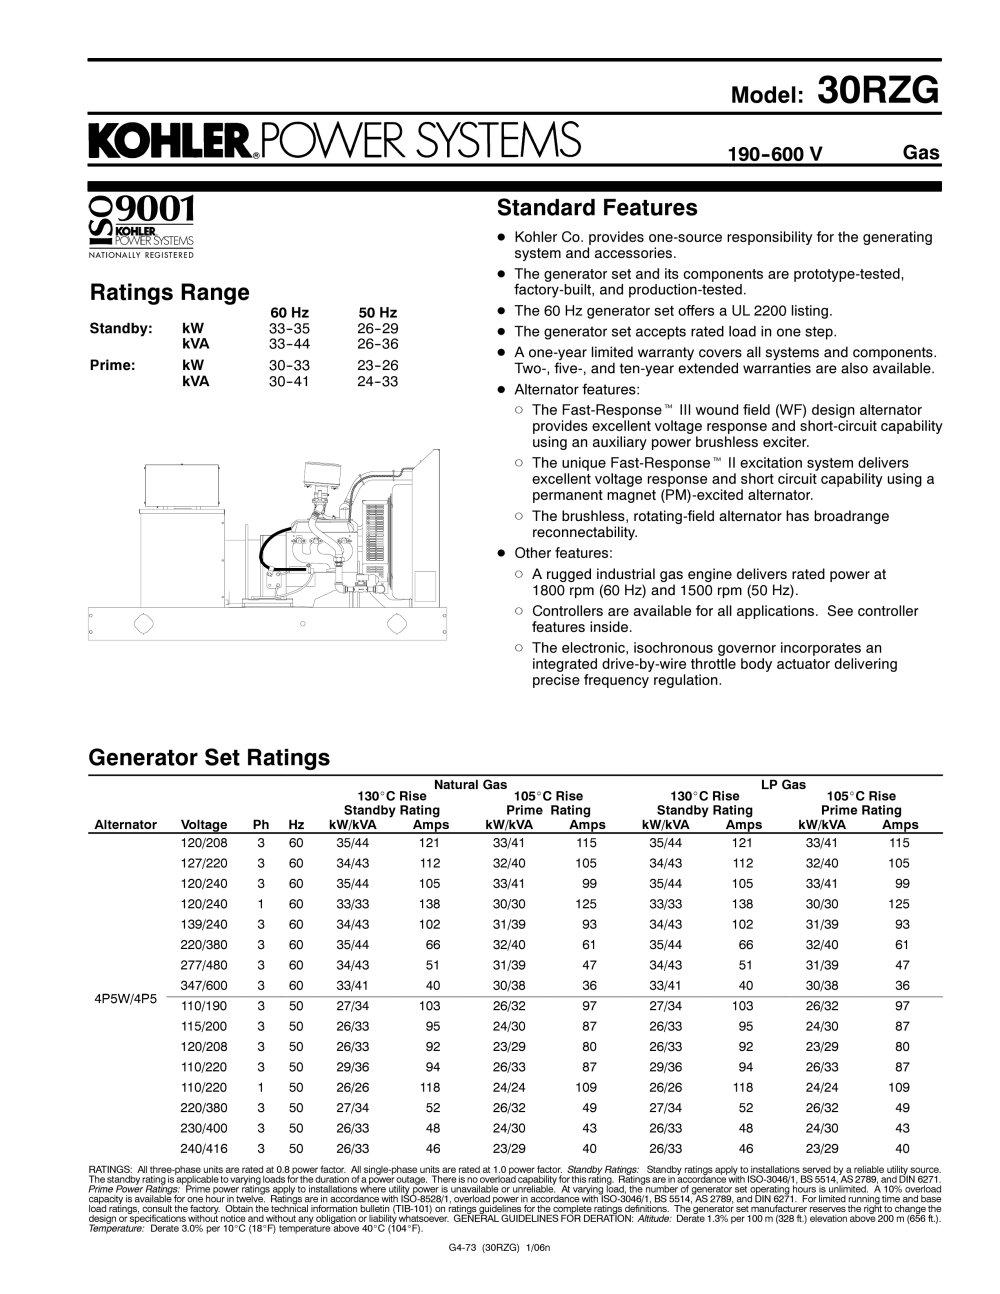 Ignition wiring diagram kohler free image about wiring diagram -  100 Kohler 22 Hp Ch22s Wiring Diagram Kohler Ignition Wiring Diagram